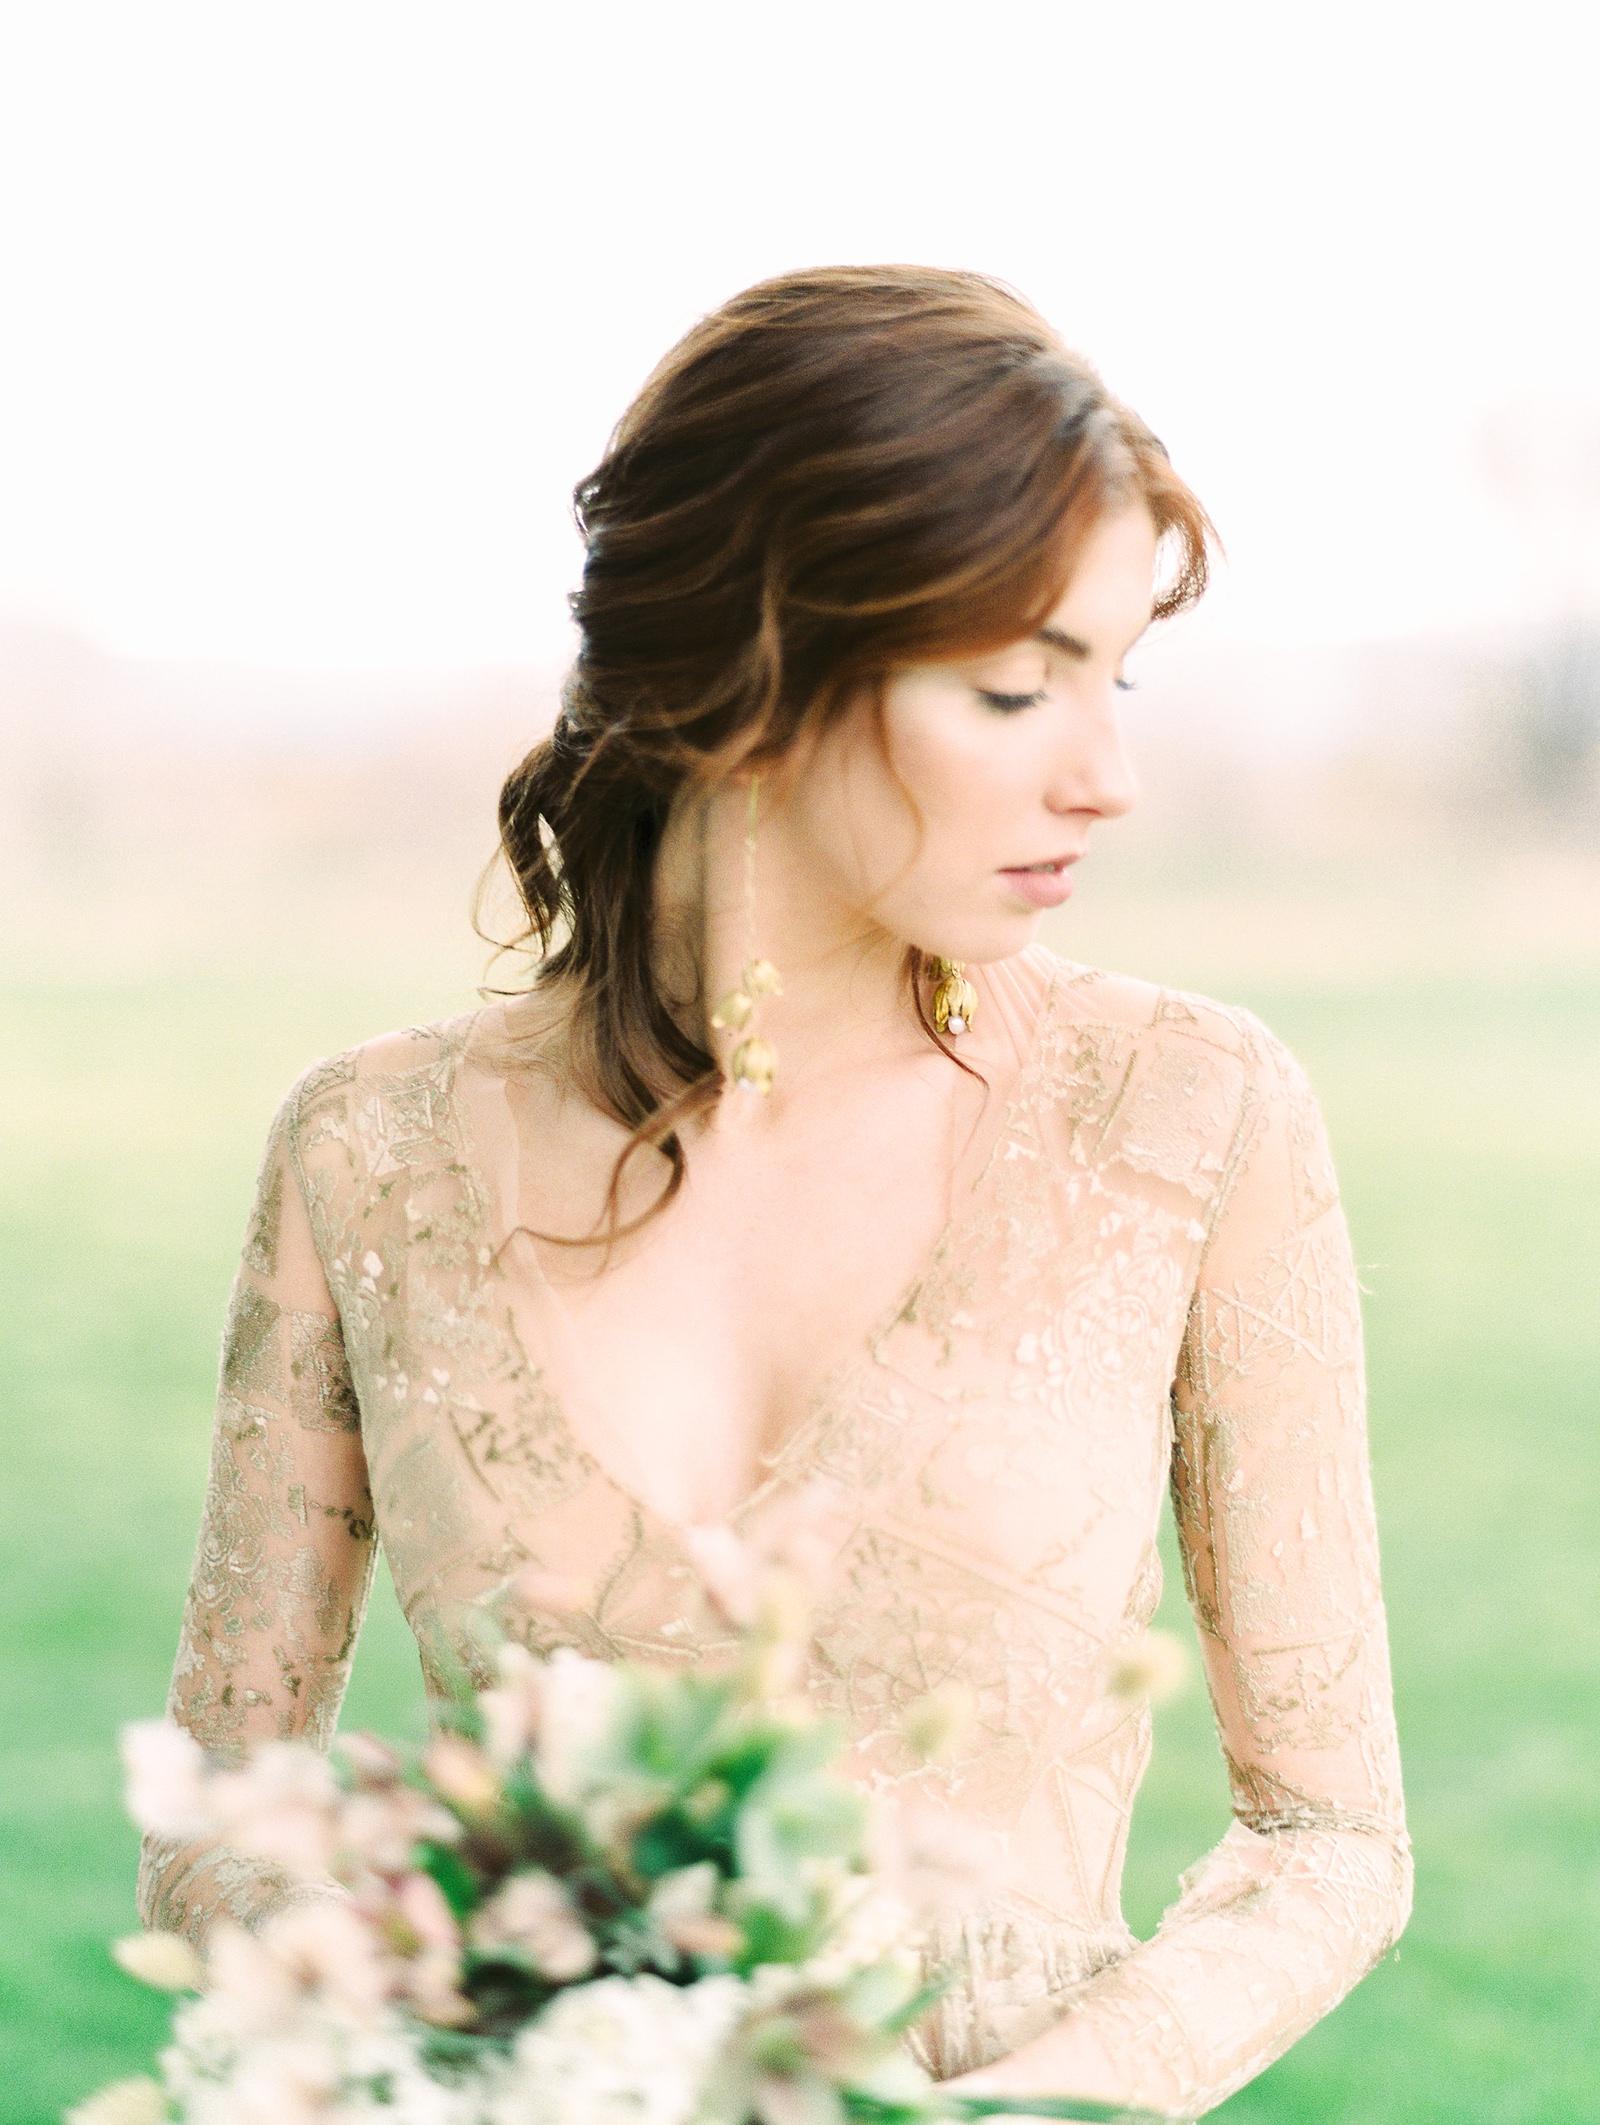 Heber Valley Natural Organic Wedding Inspiration at River Bottoms Ranch, Utah wedding photography, bride with long sleeve sheer lace wedding dress